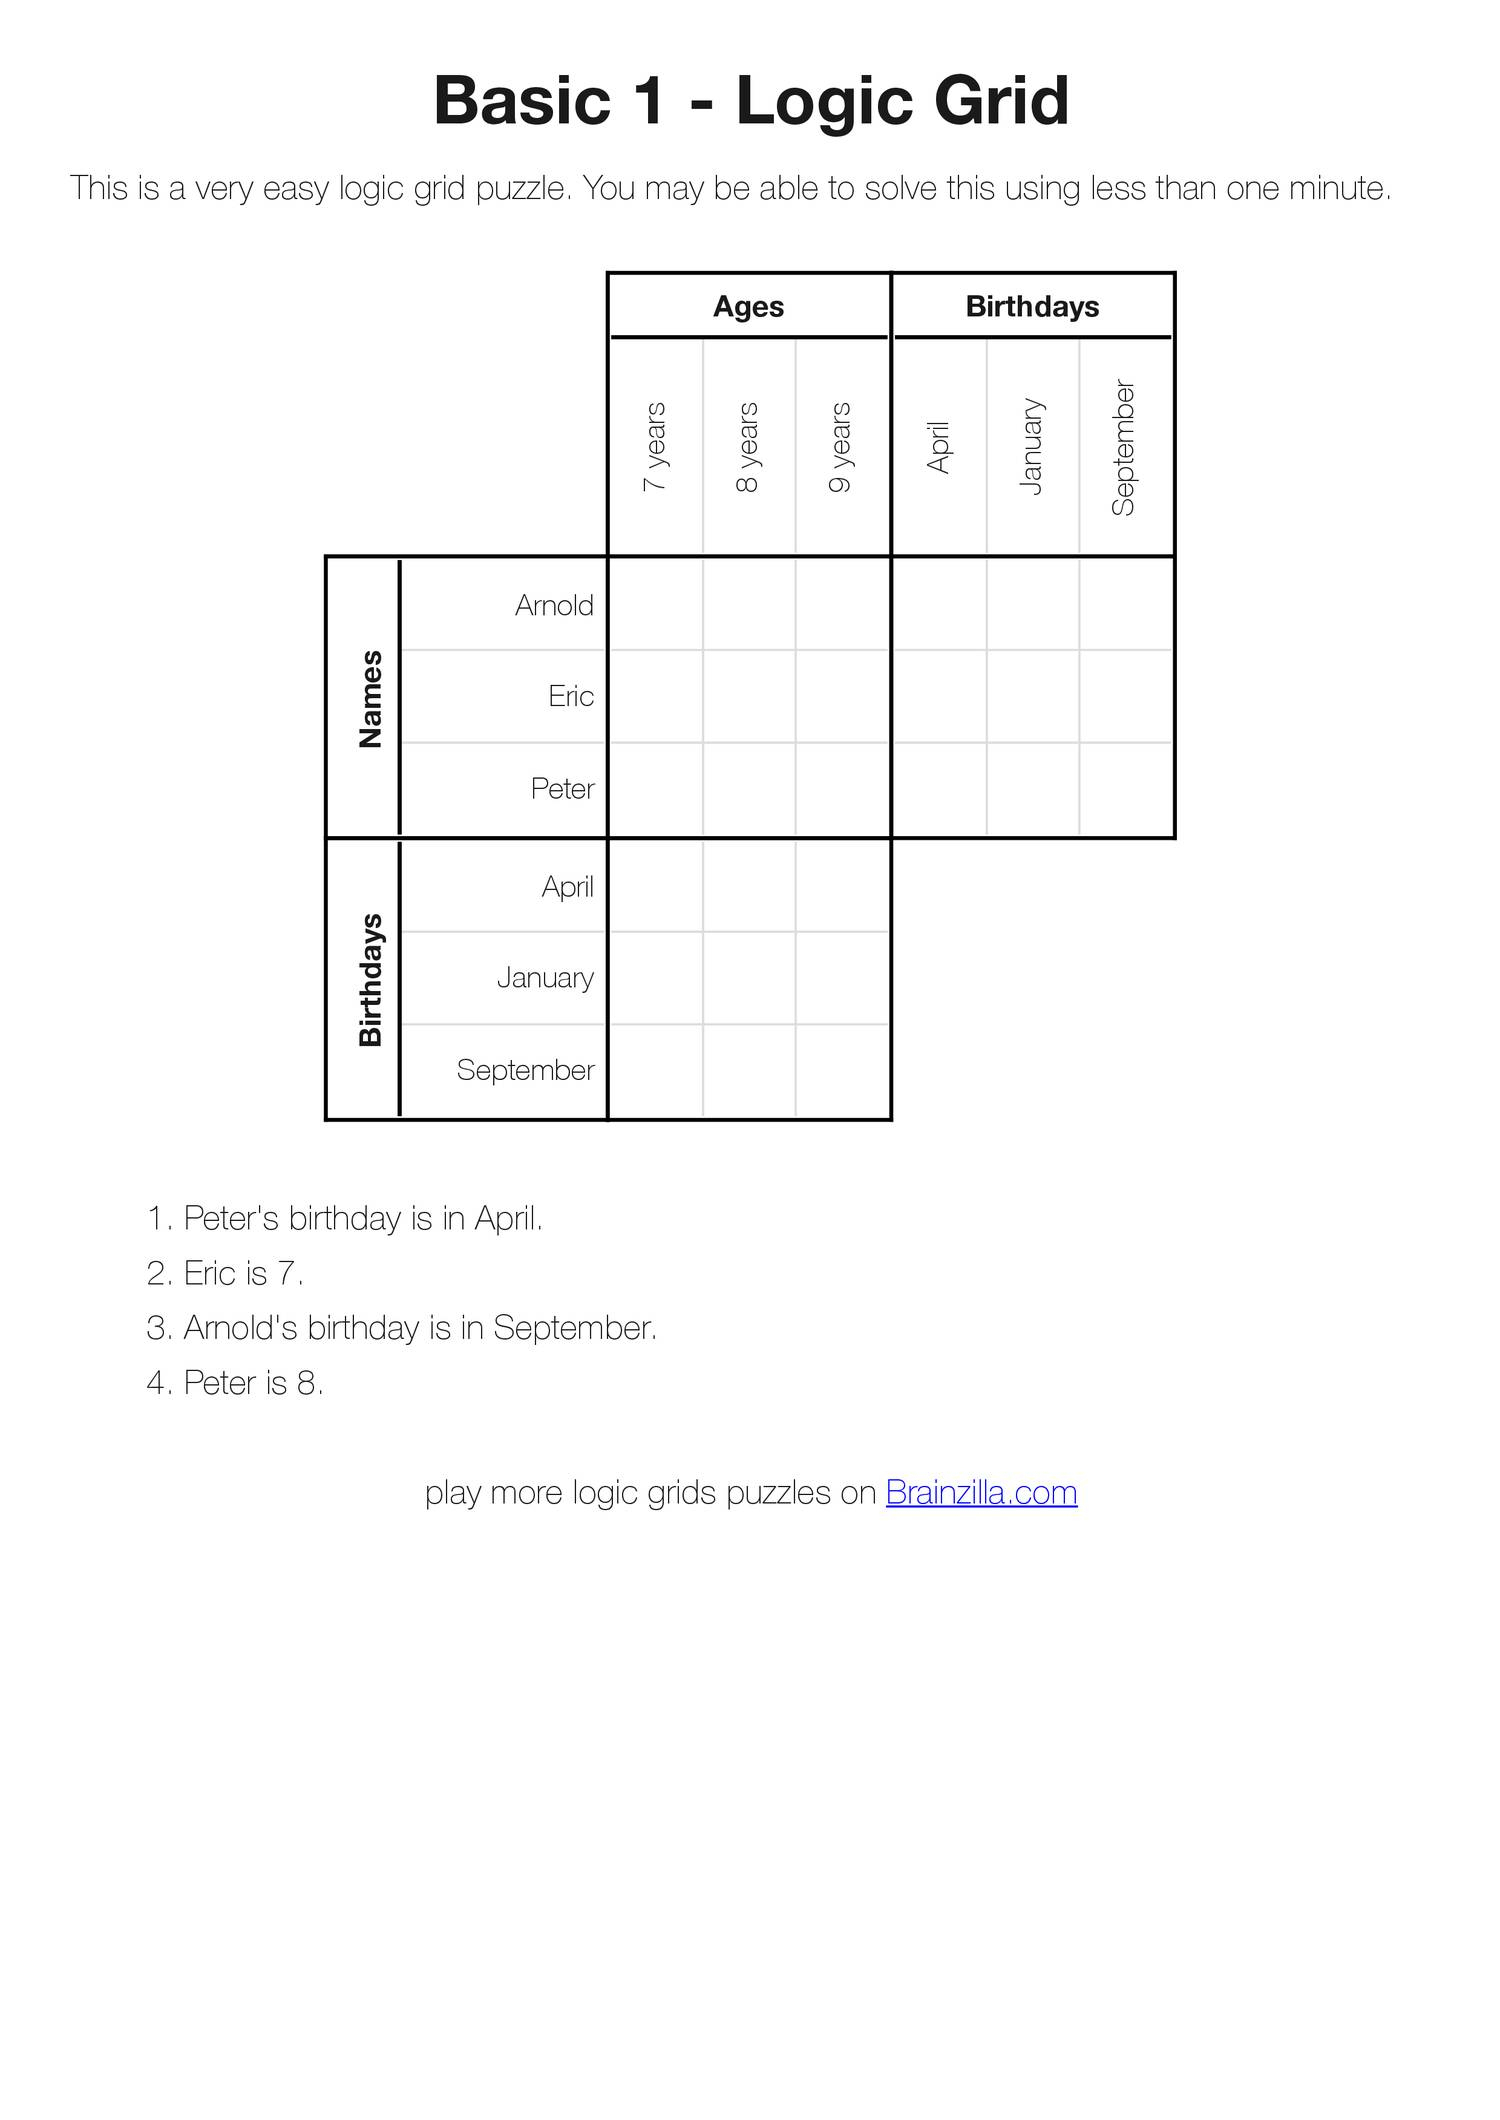 Printable Logic Grid Puzzles (Brainzilla).pdf | Docdroid - Printable Logic Puzzle Grid